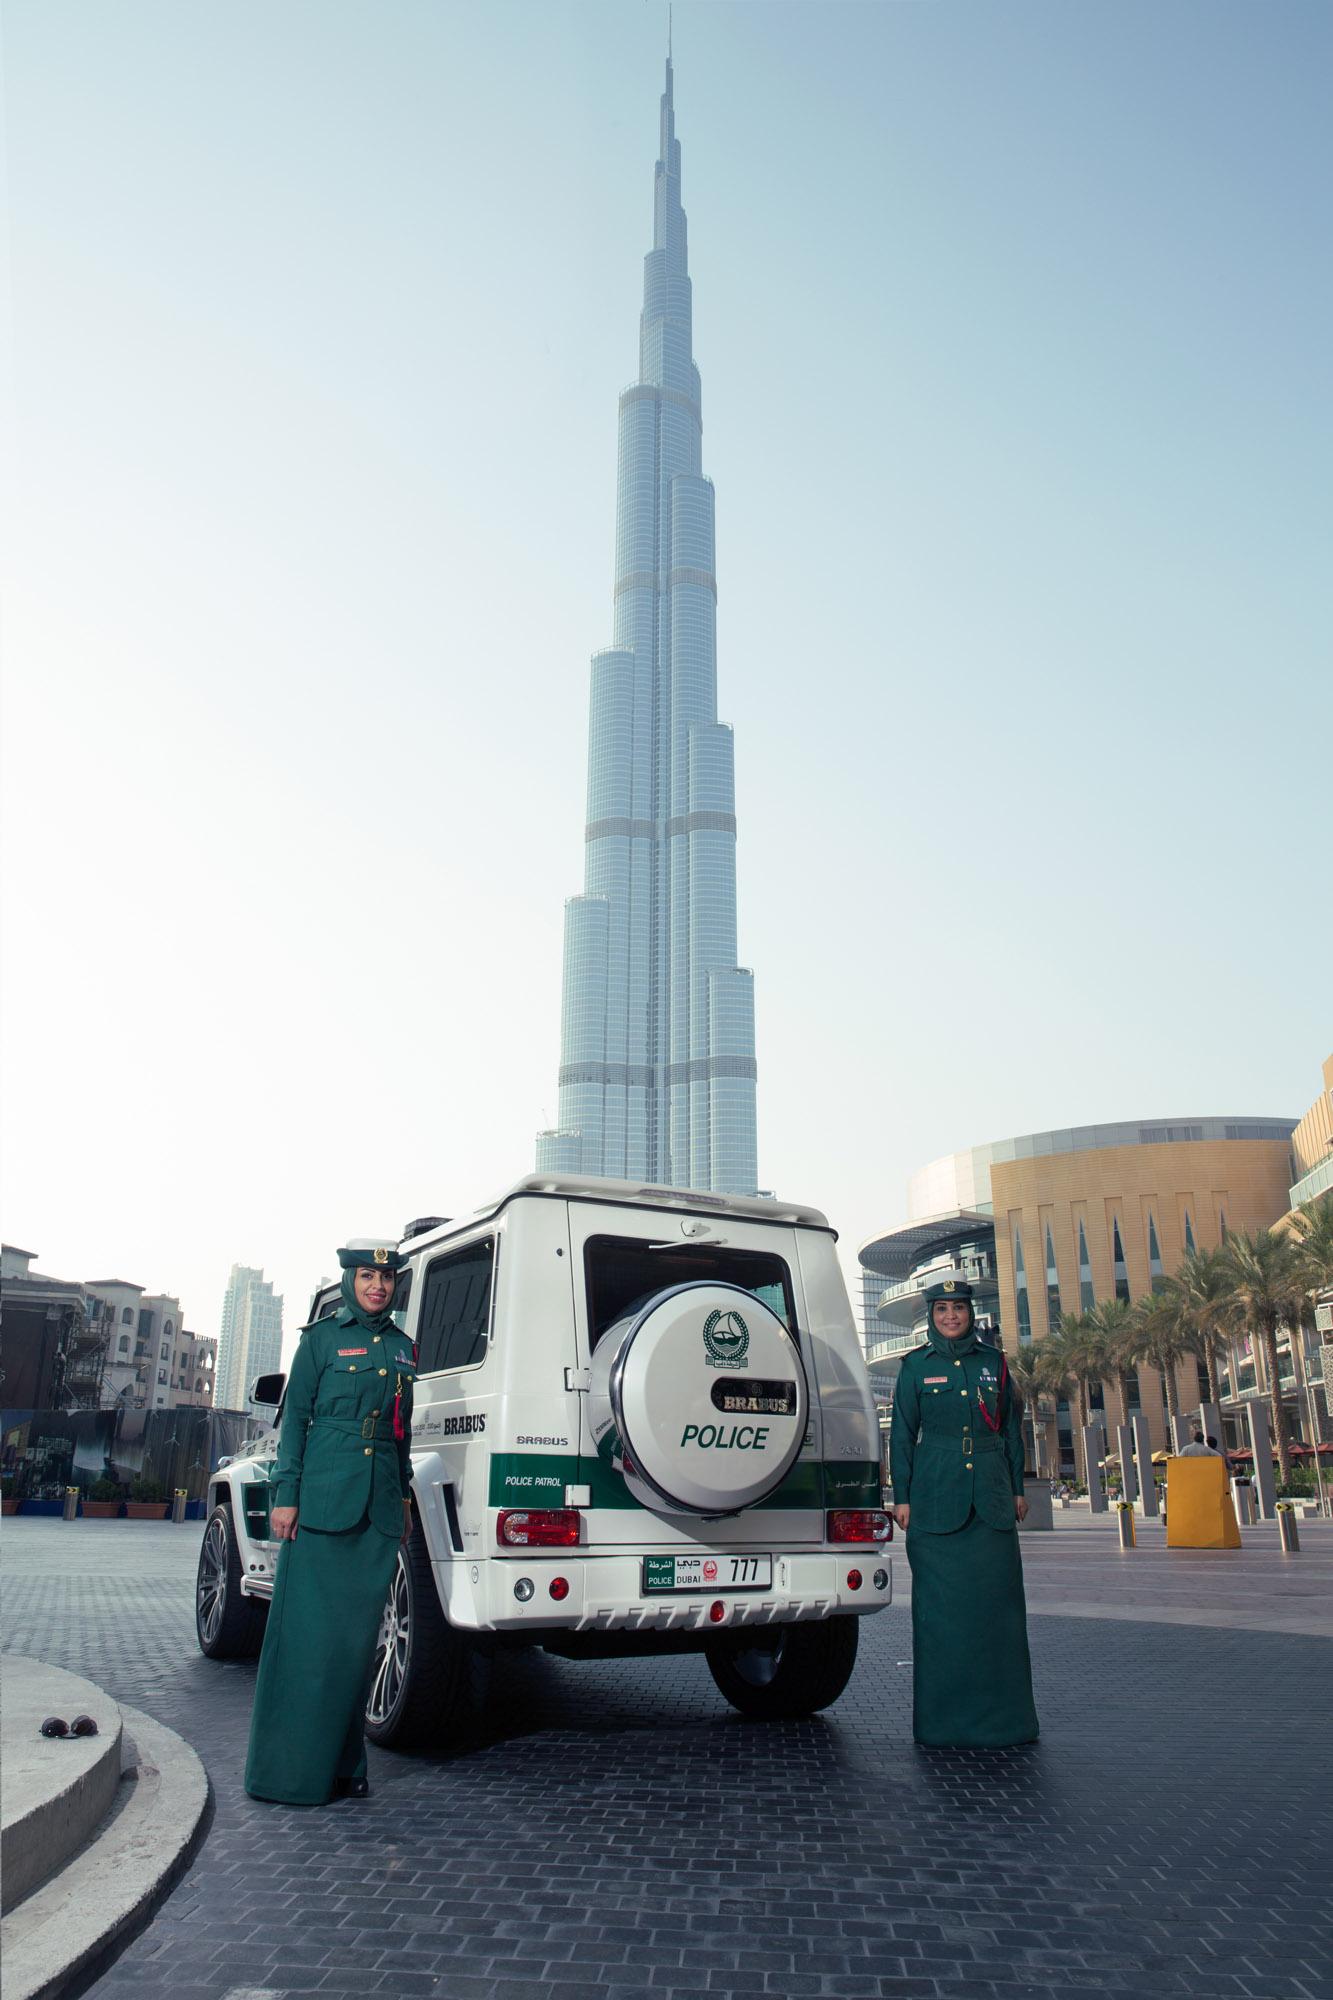 Dubai Police Car Wallpapers Mercedes Benz G Class B63s 700 Widestar Dubai Police